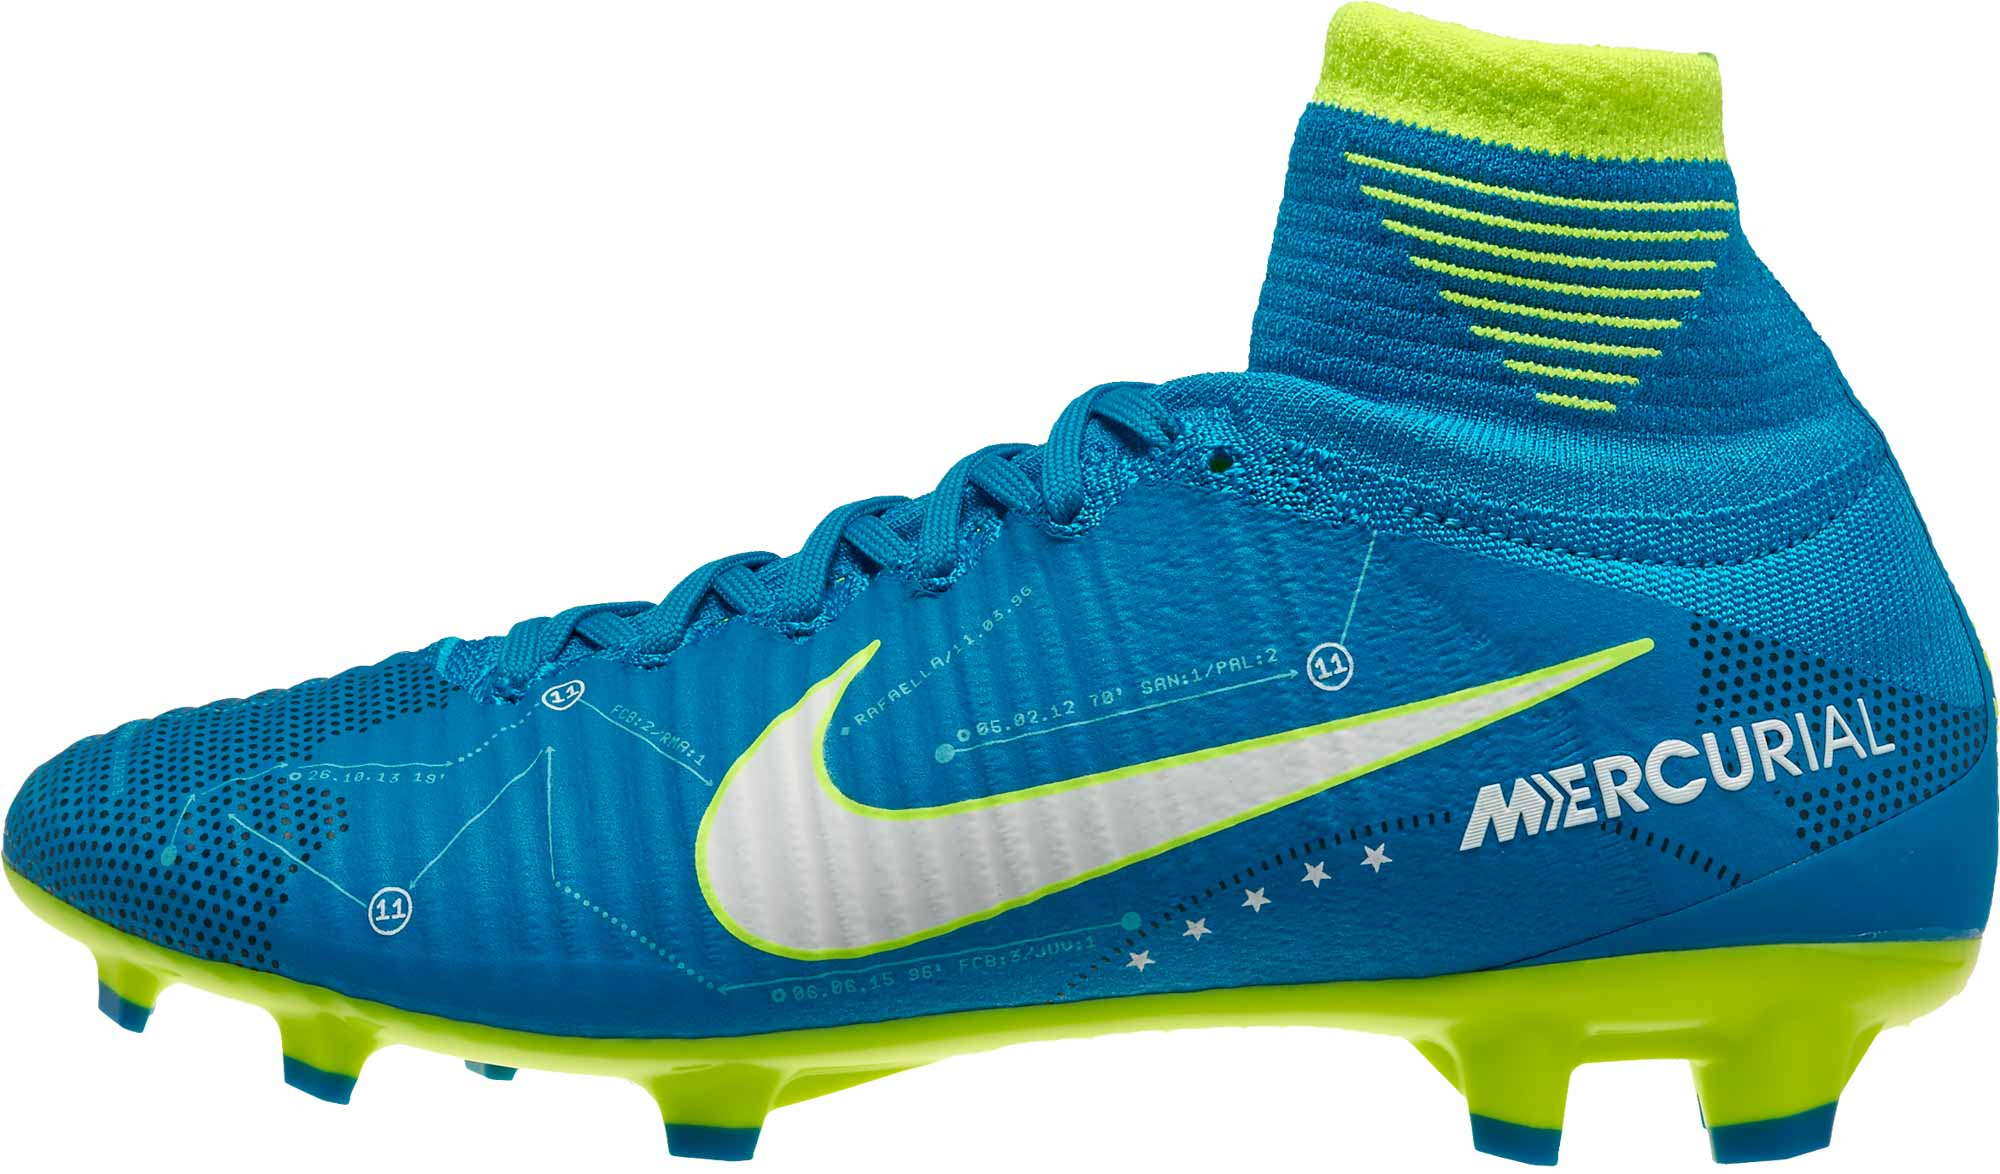 sports shoes 8f19e c0ea2 Nike Kids Mercurial Superfly V FG - Neymar - Blue Orbit   White ...